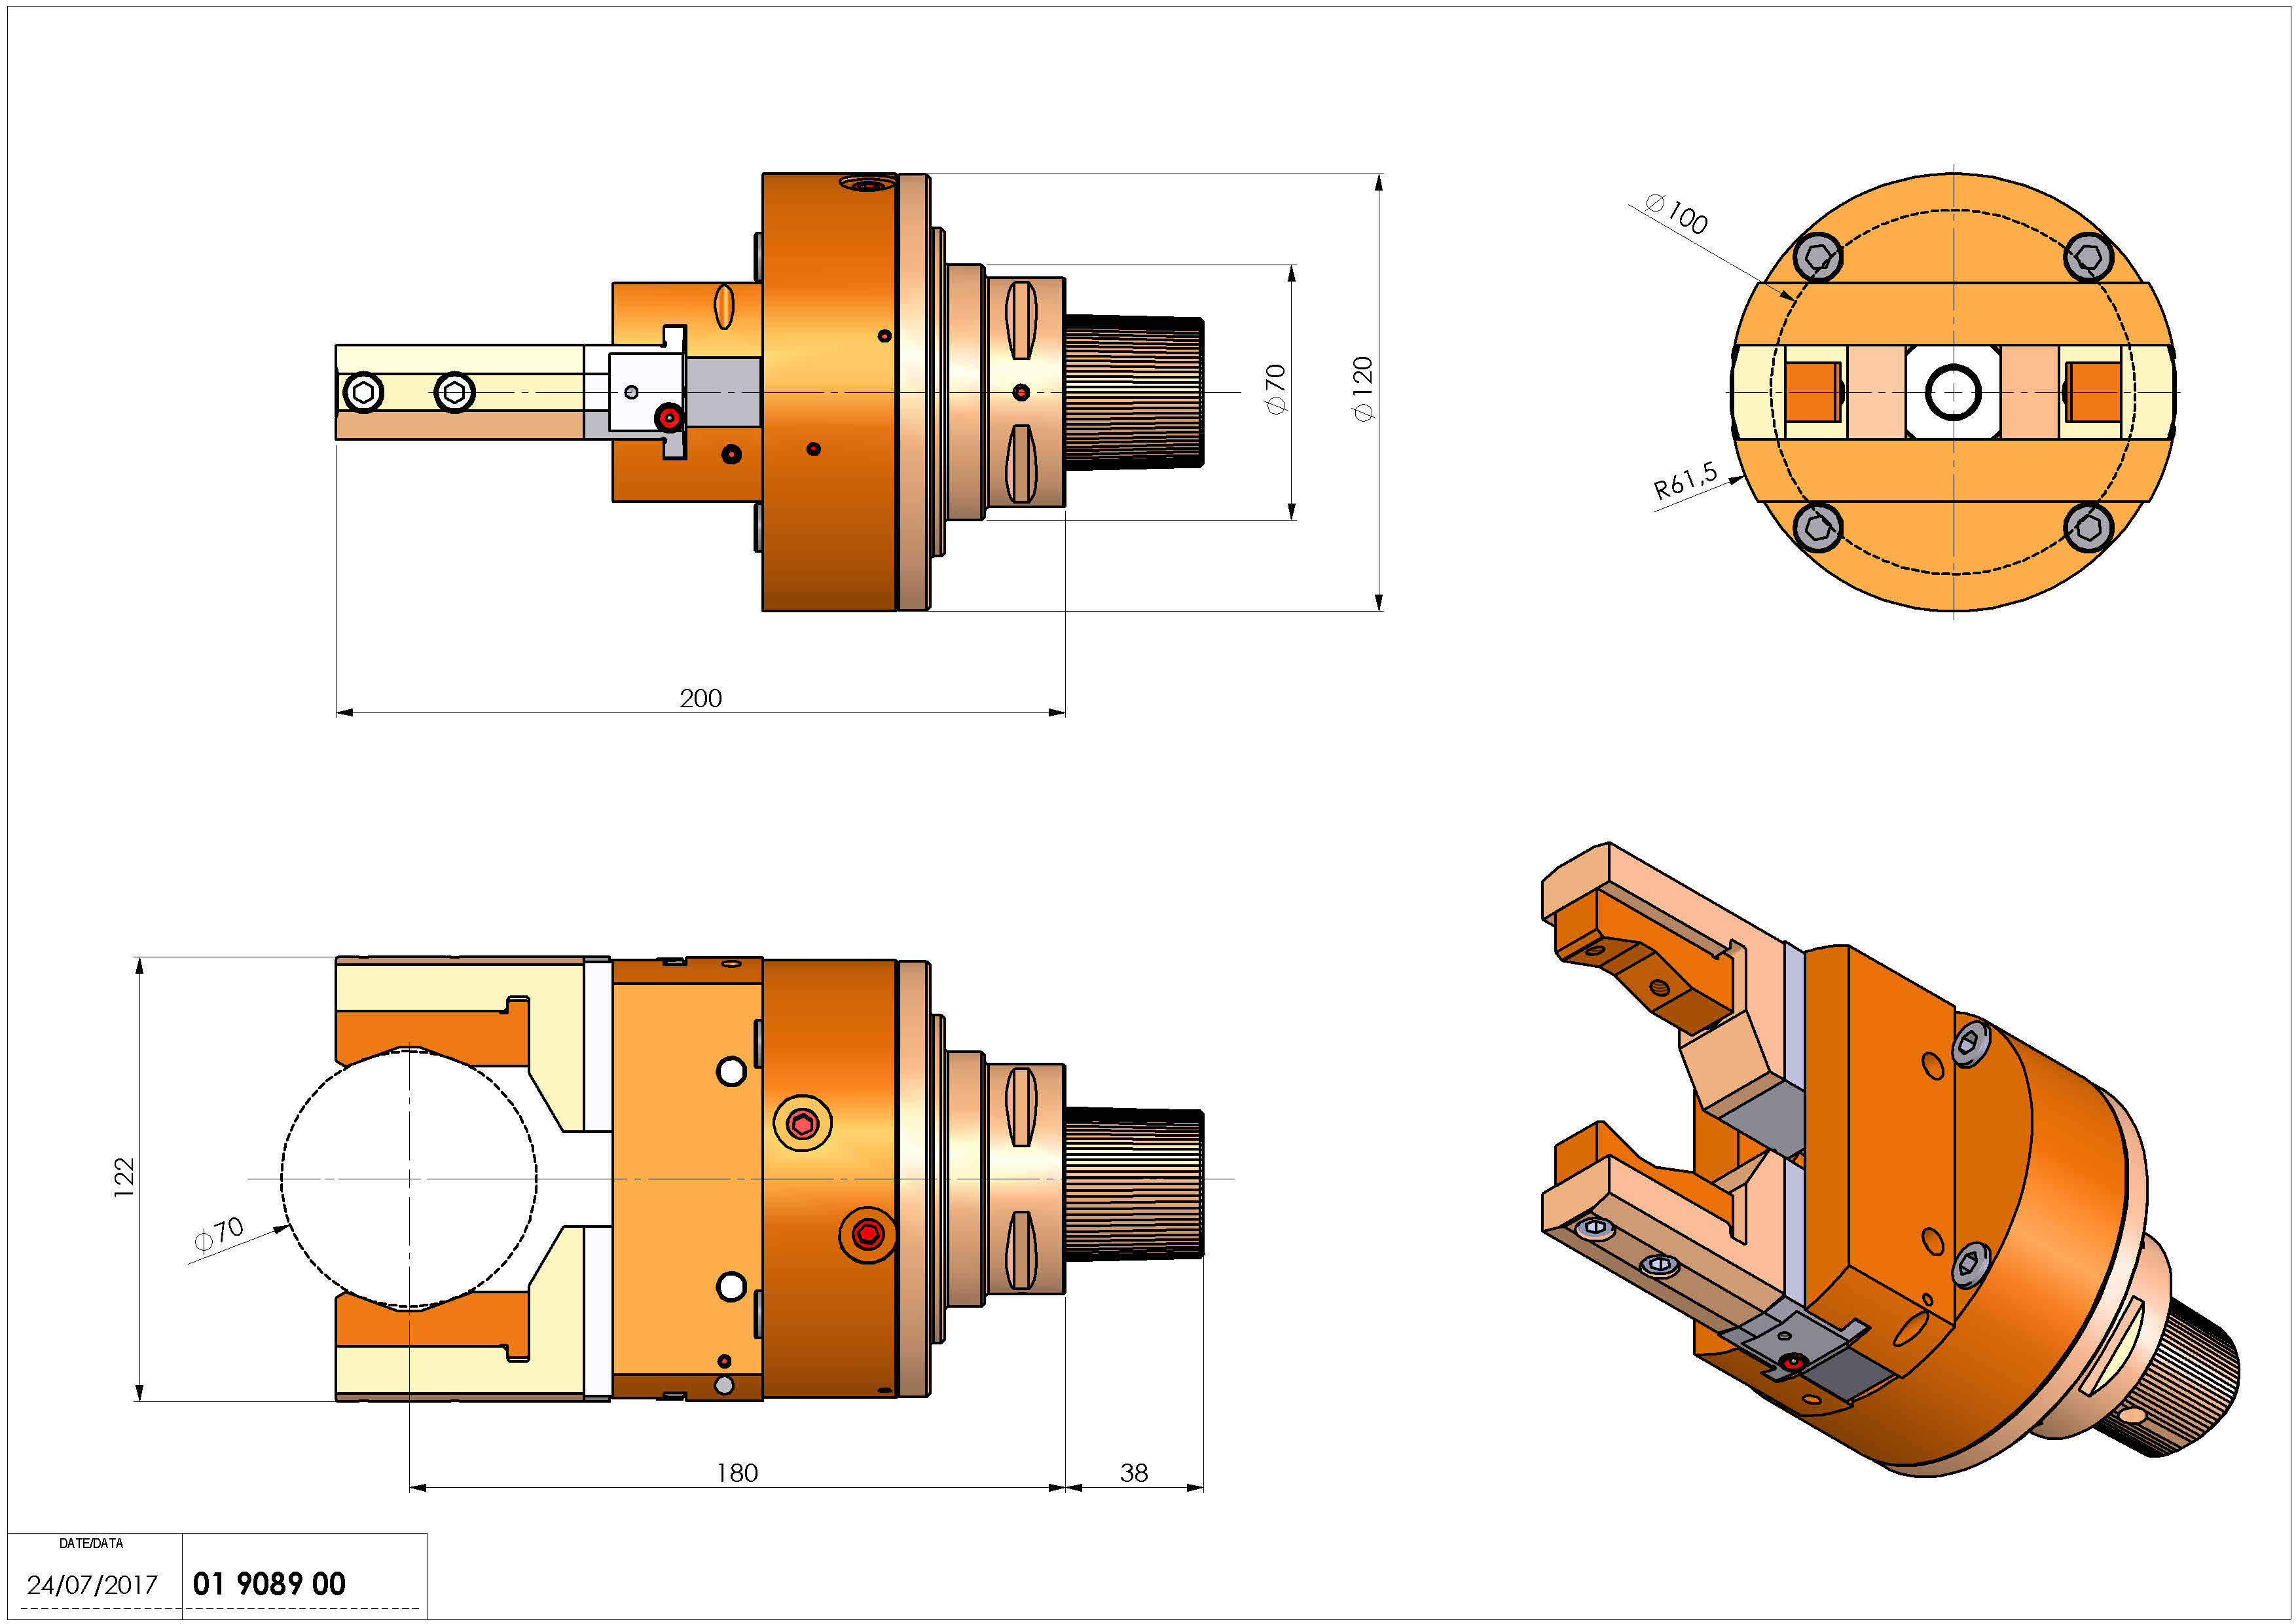 Technical image - ATRAUTCD123-2 15CAPTO-C6NOGRMZ.